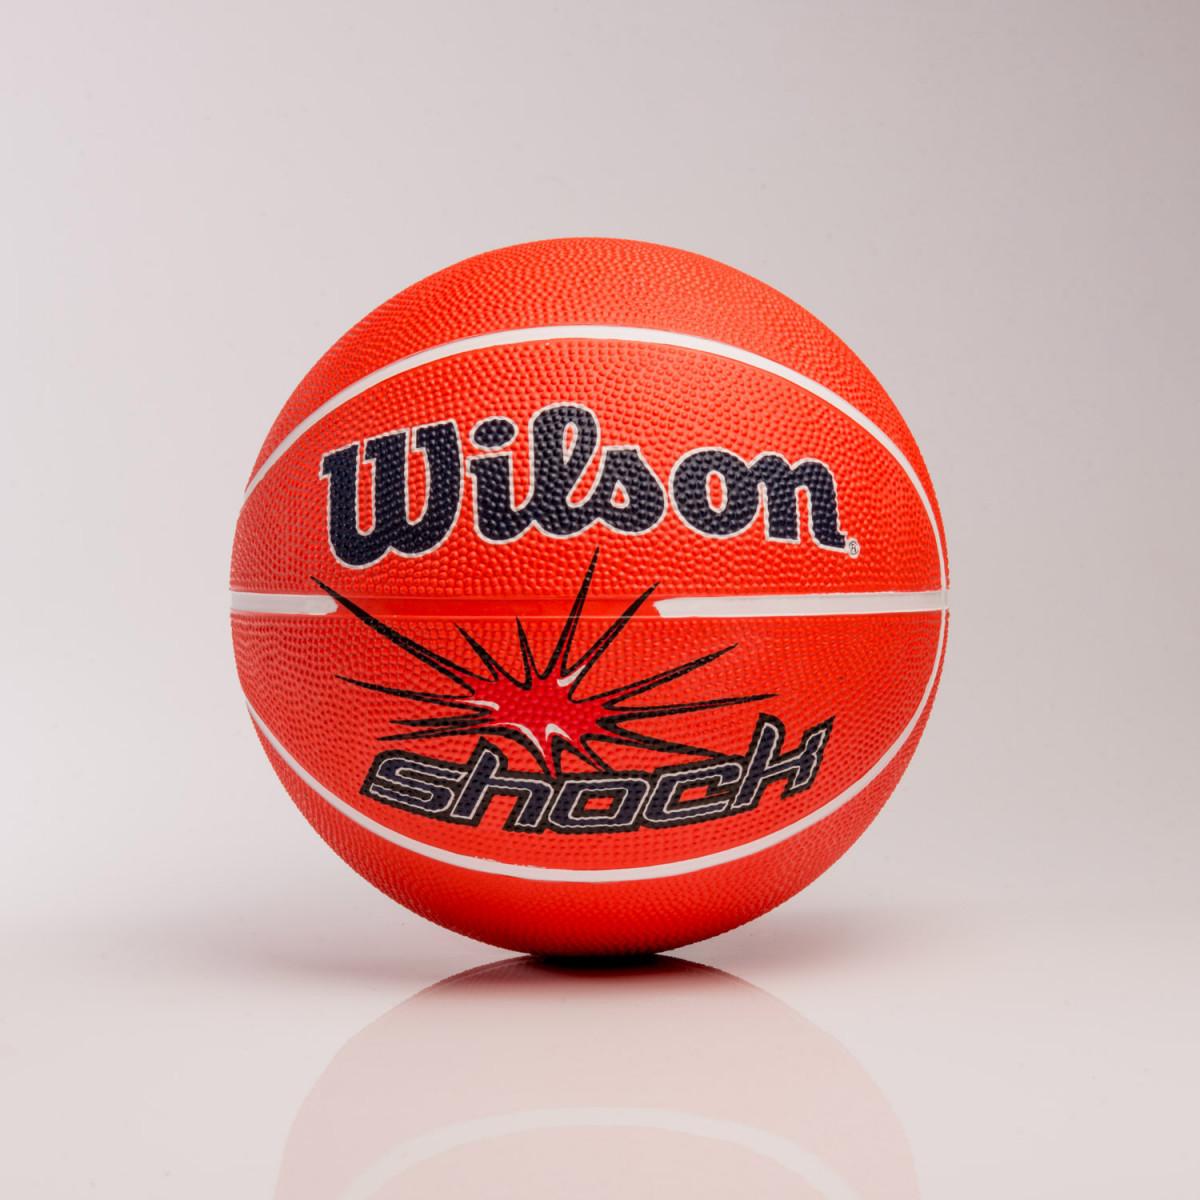 PELOTA WILSON SHOCK PLUS ORBL BASKET SZ5